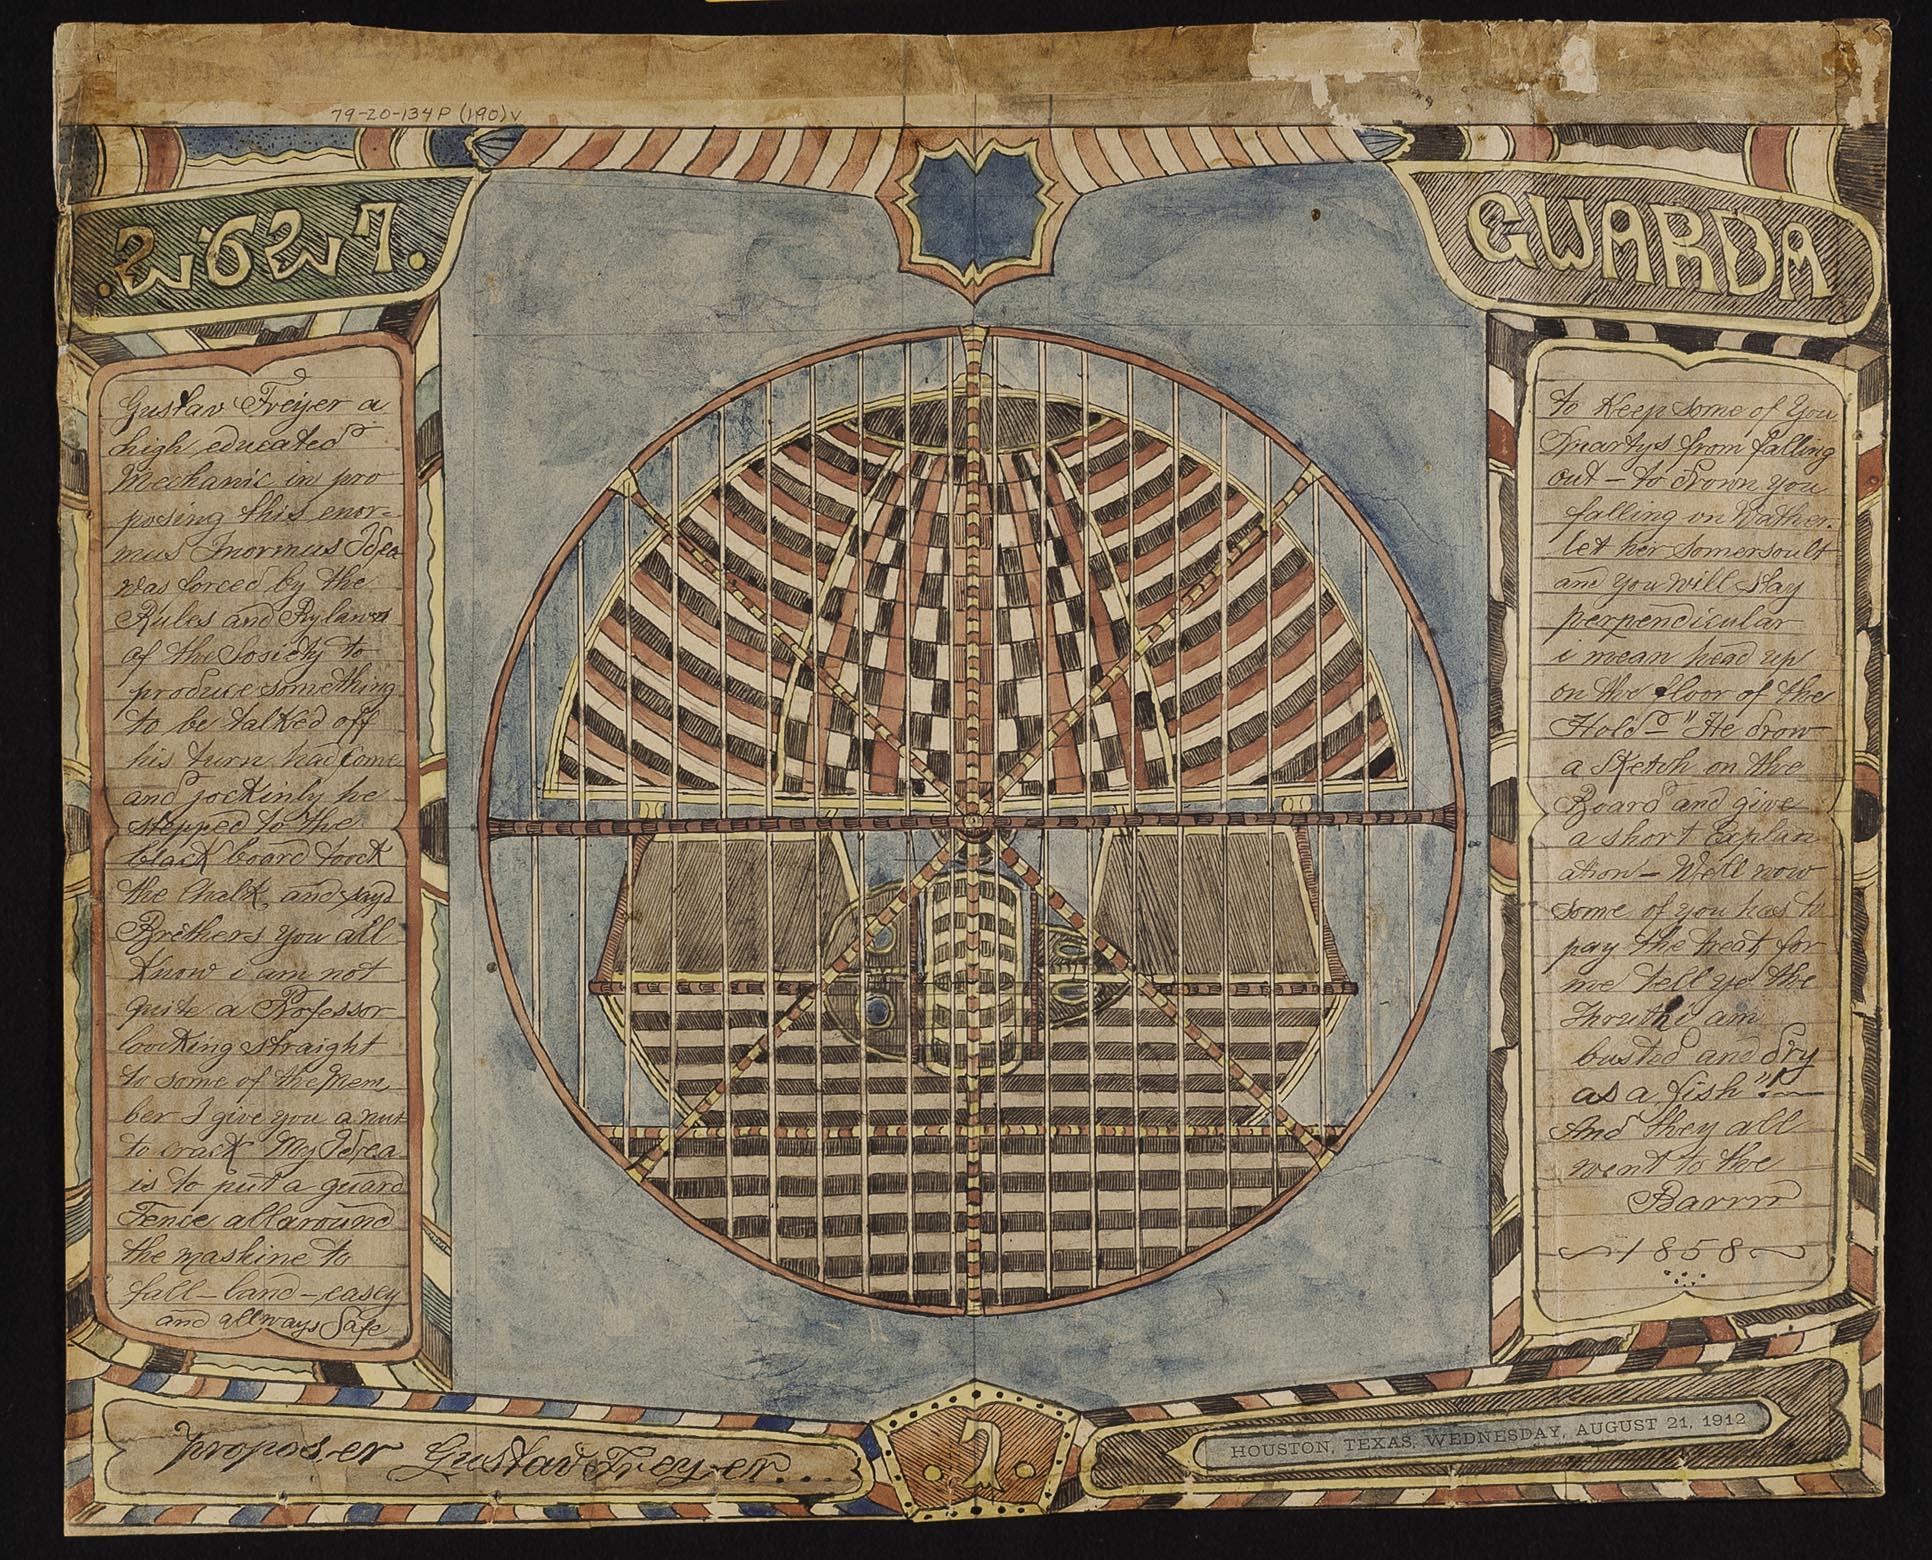 Charles A.A. Dellschau's Plate 2627 Guarda